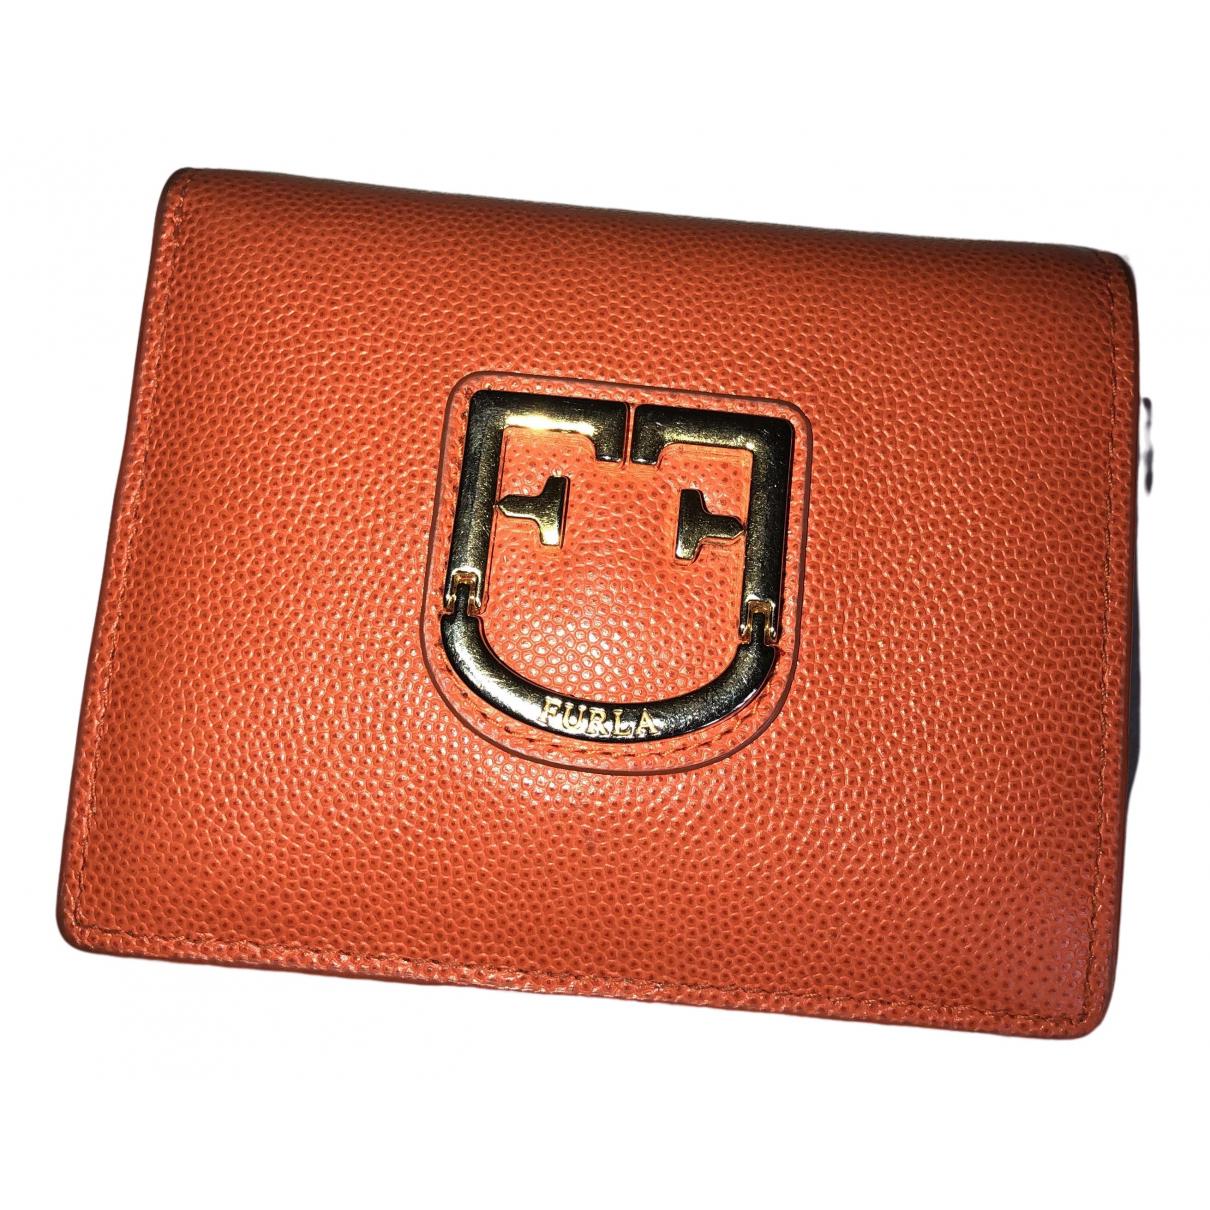 Furla \N Portemonnaie in  Orange Lackleder